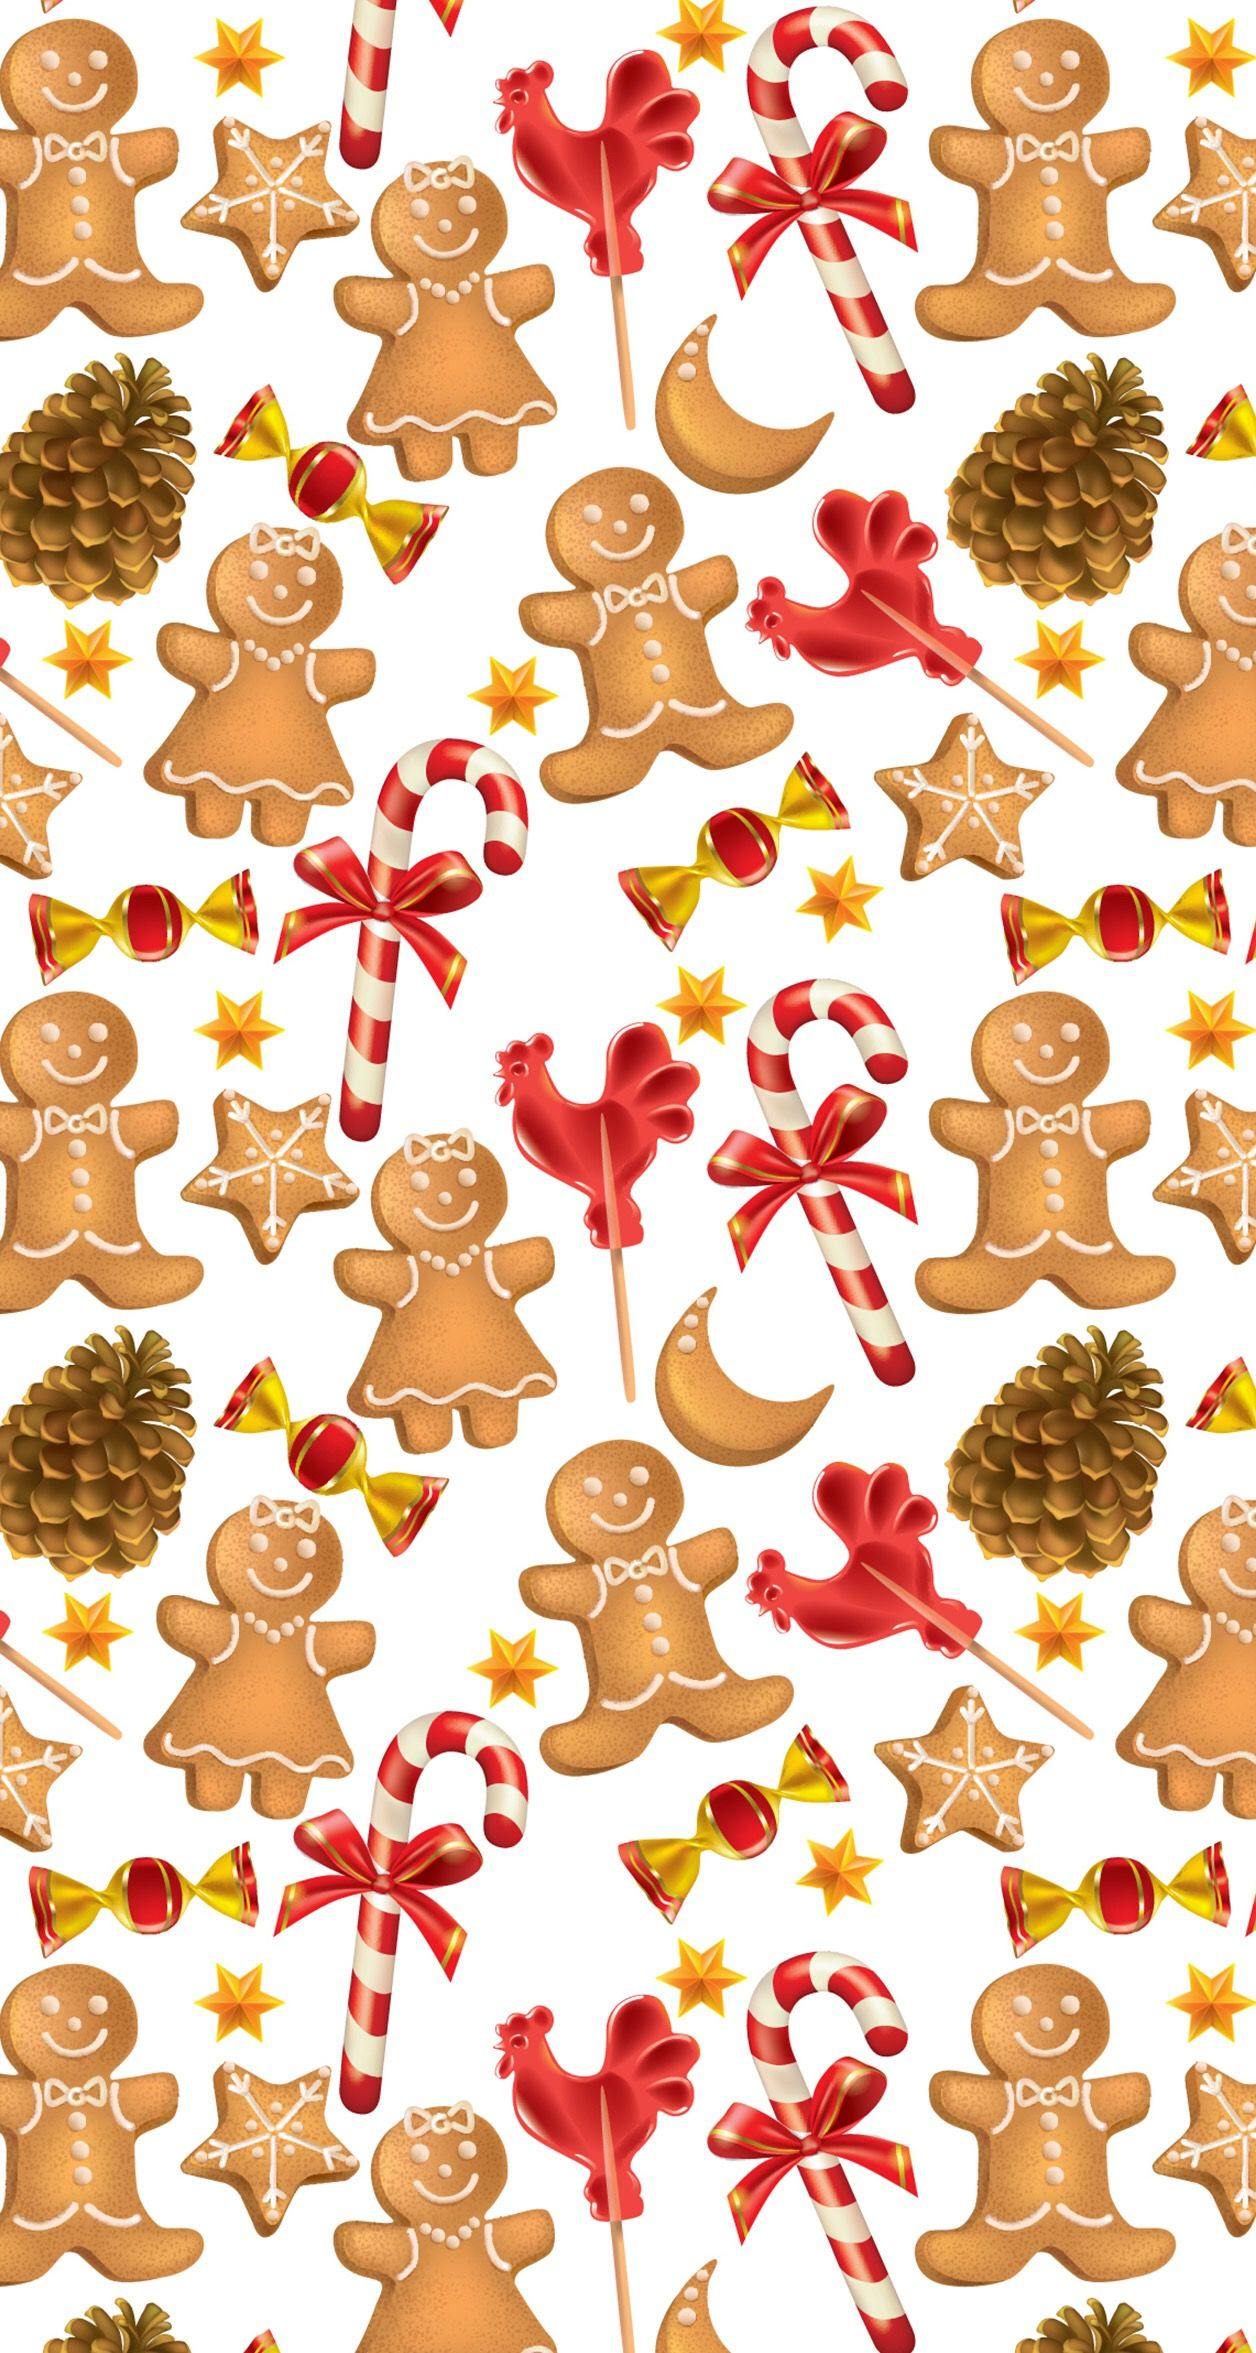 Gingerbread Men Christmas Candy Cane Christmas Wallpaper